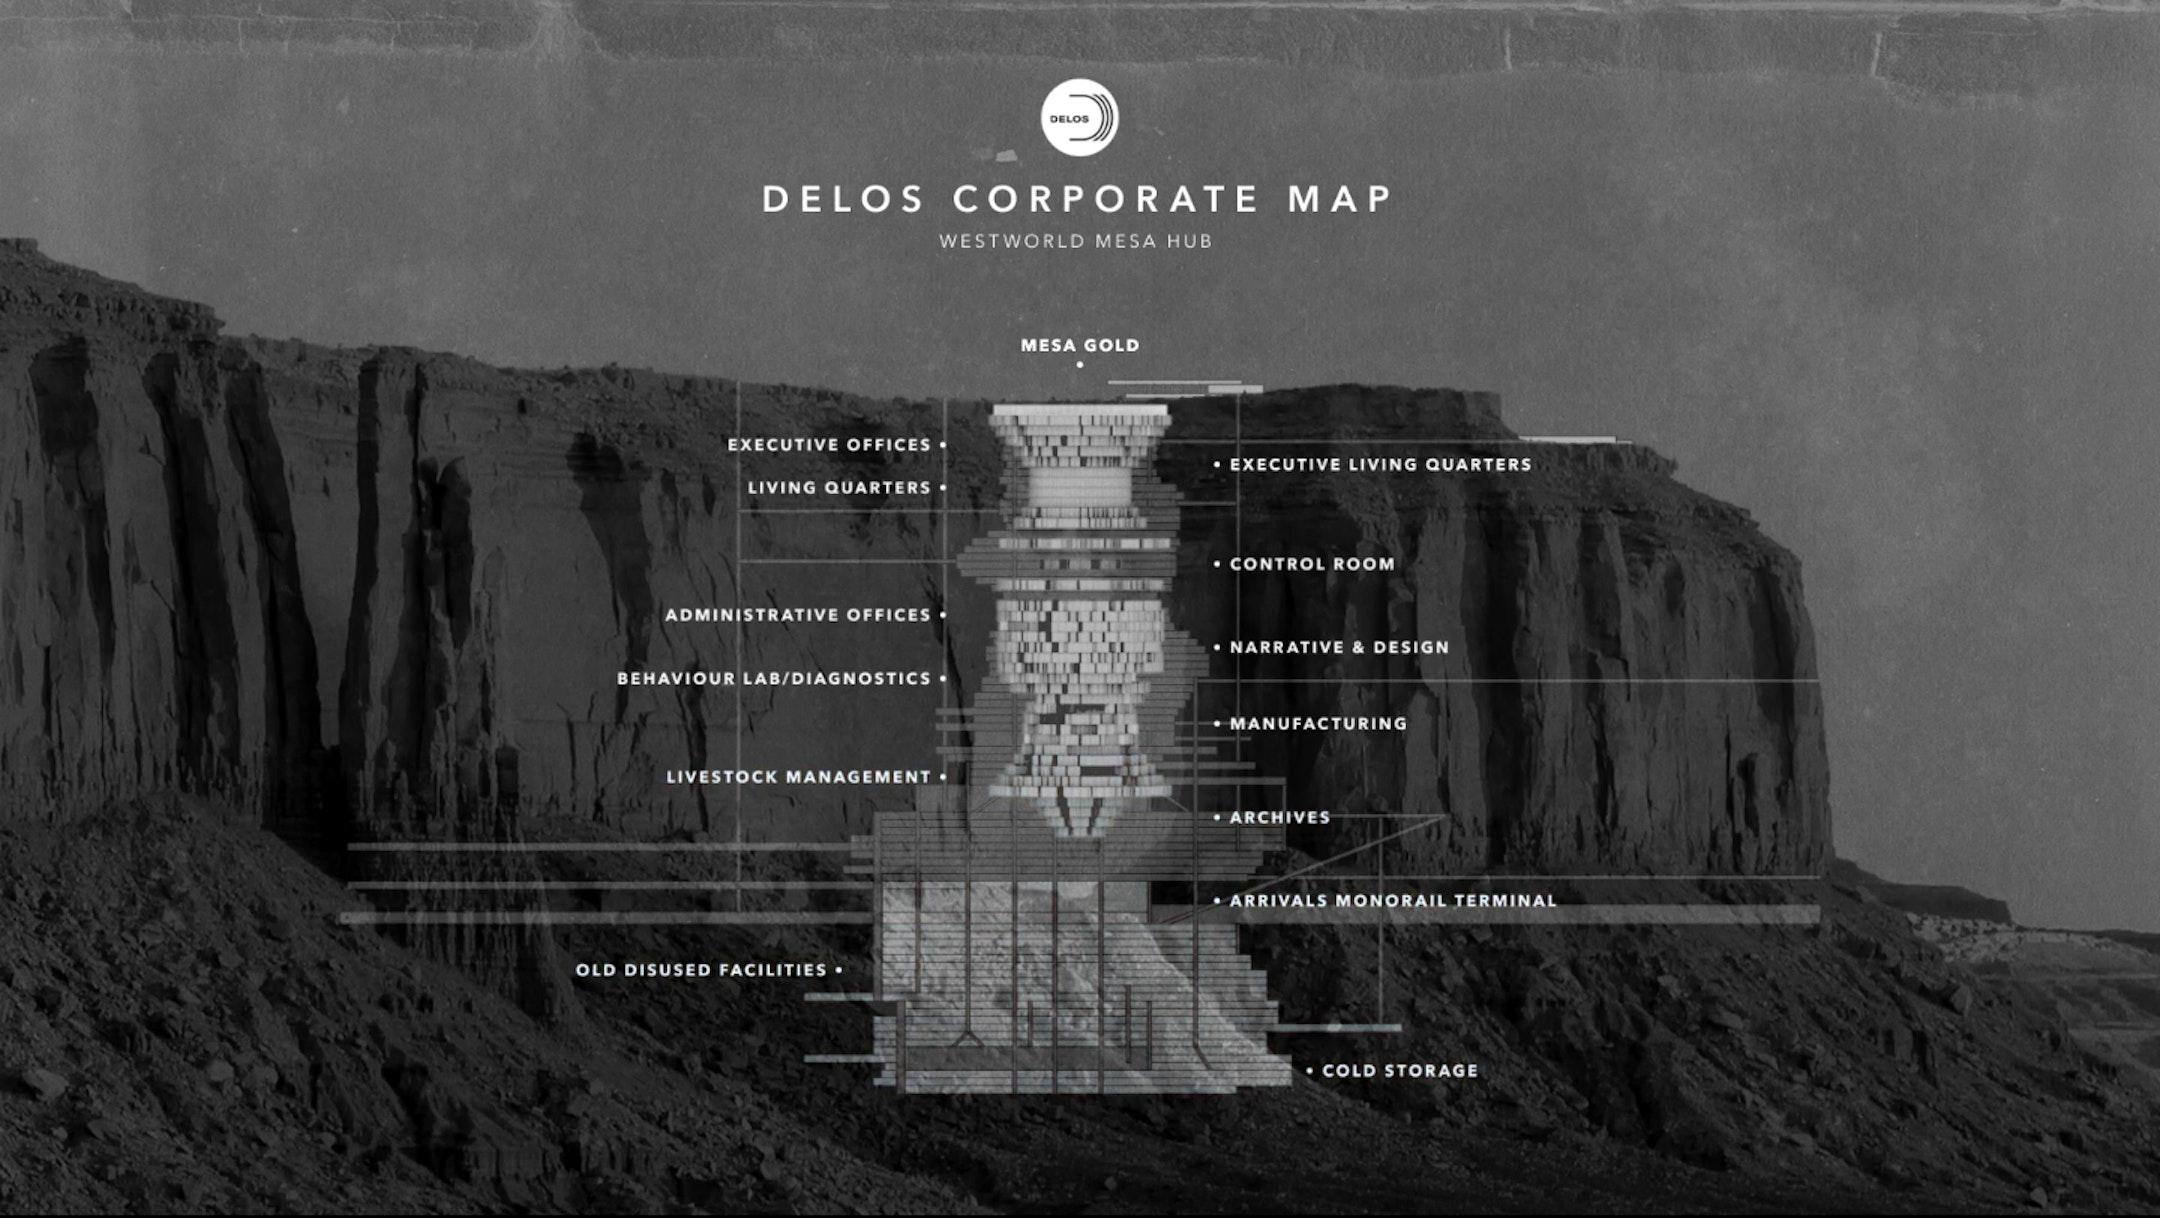 Westworld's Delos Corporate Map